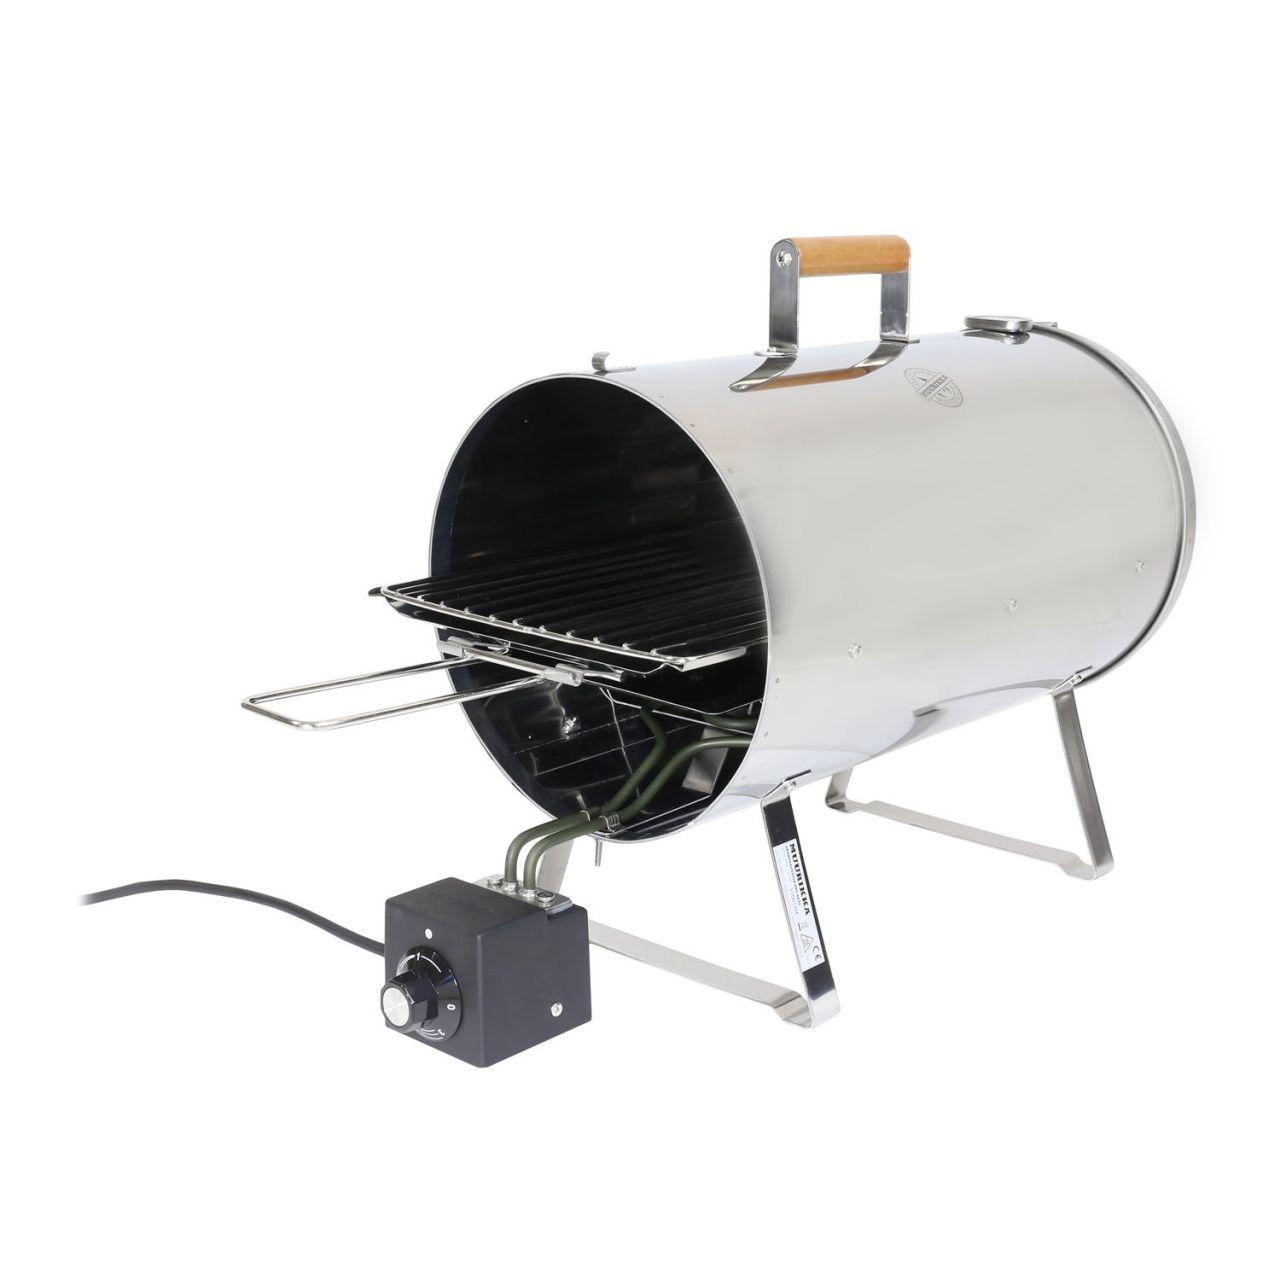 Muurikka elektrischer Räucherofen Pro 25 cm � 1100W 54420010